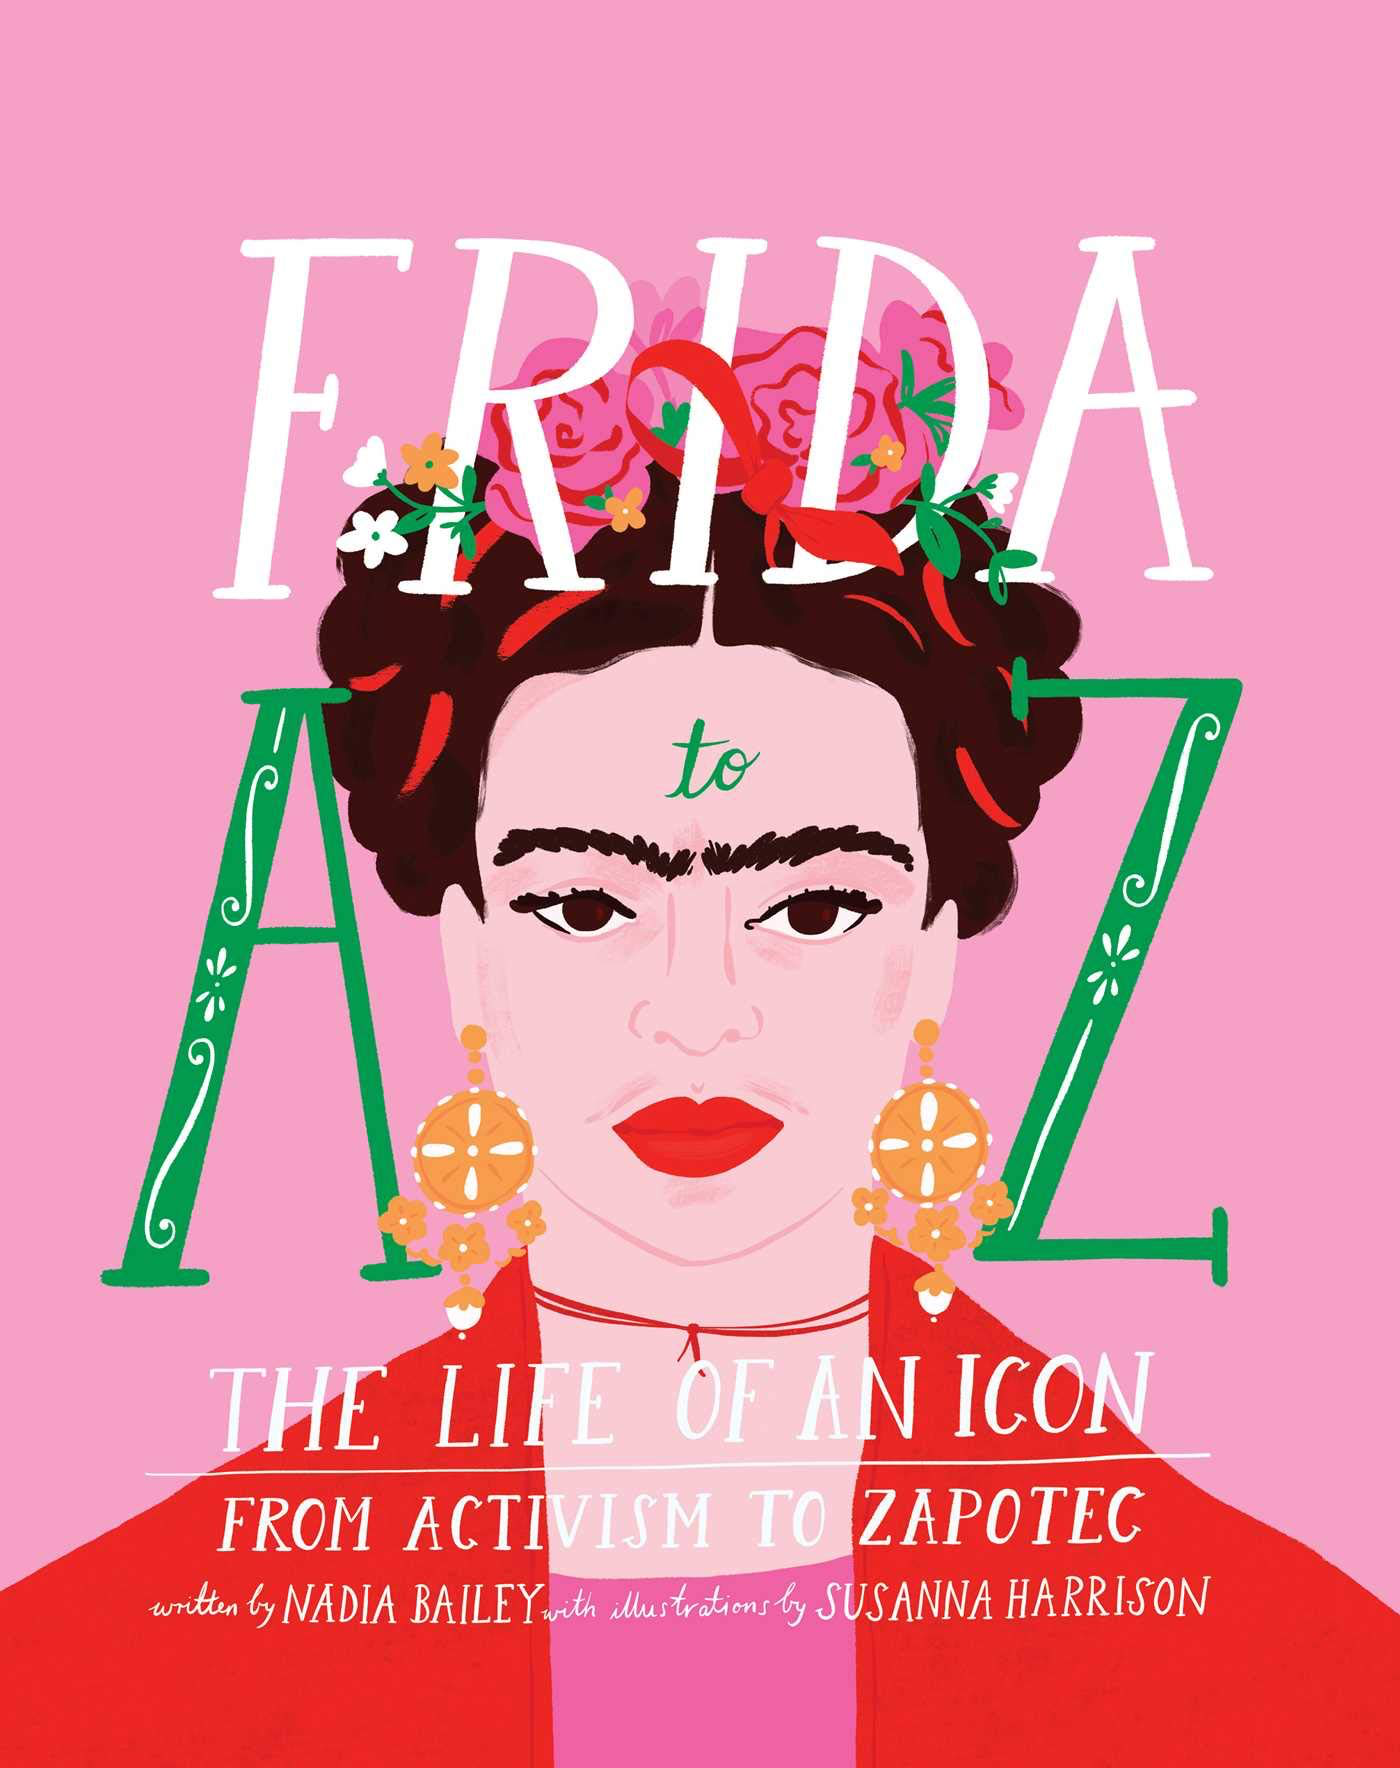 Inspirational Frida A to Z